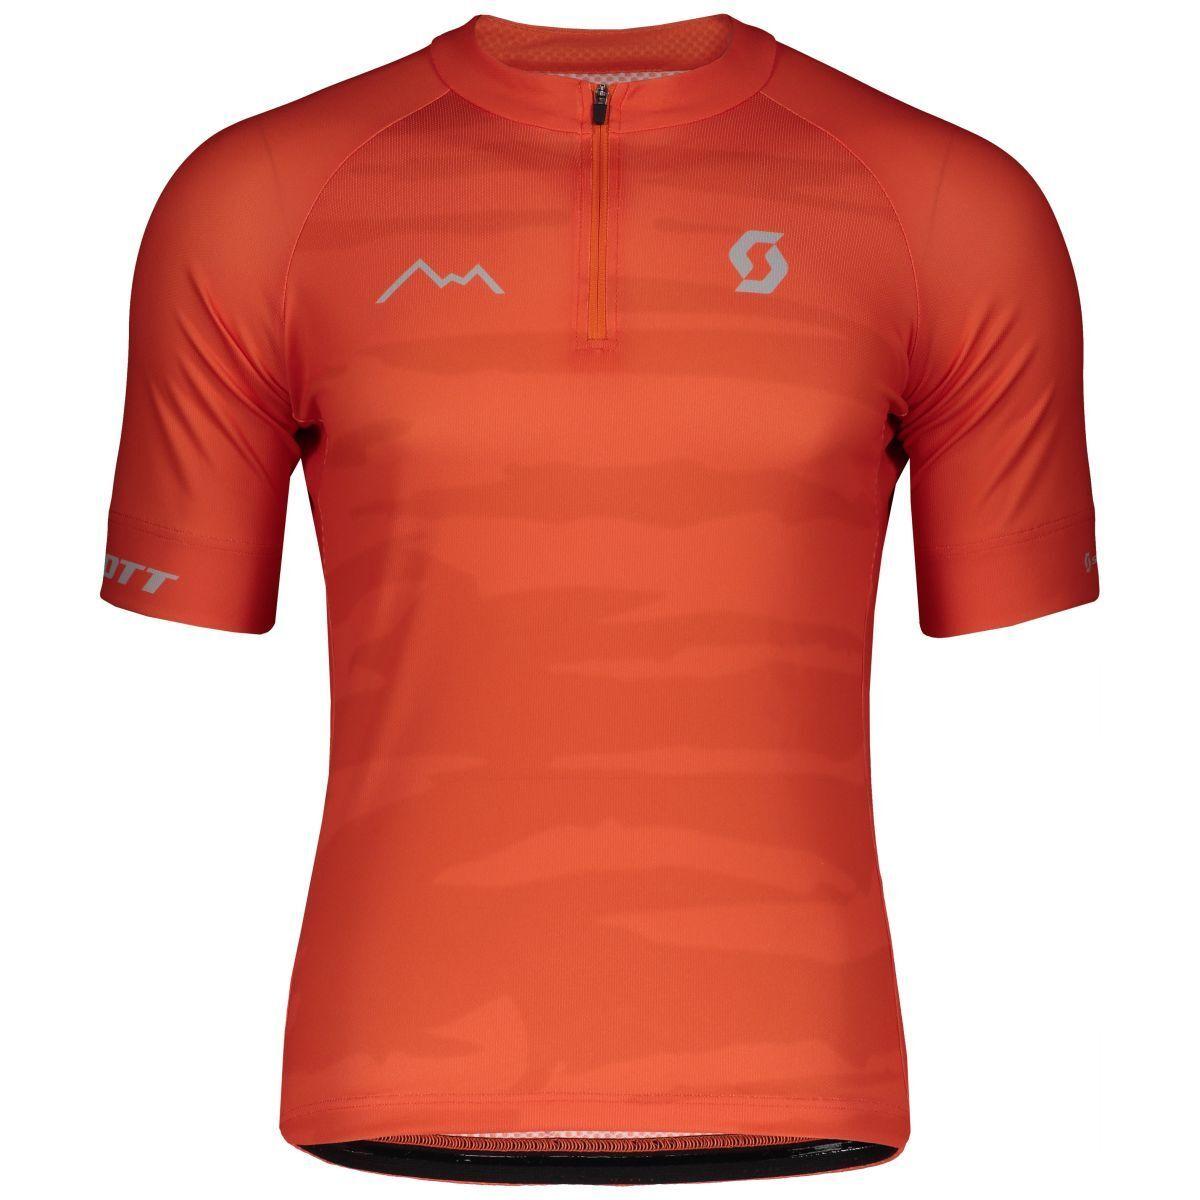 Scott Endurance 20 bicicleta camiseta  brevemente naranja 2019  wholesape barato